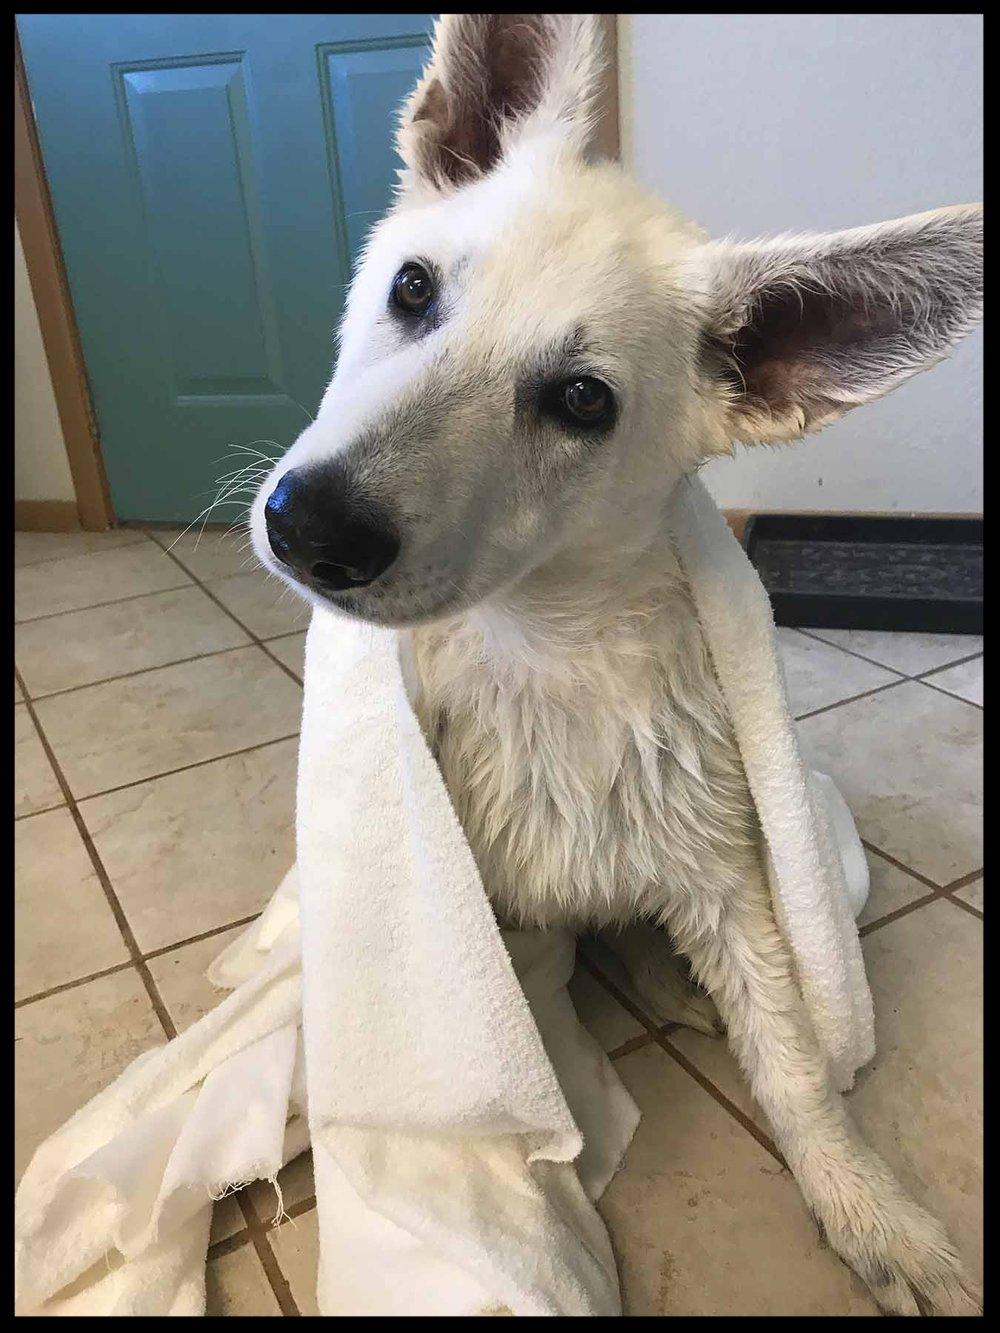 A Polarbear after Bathtime.